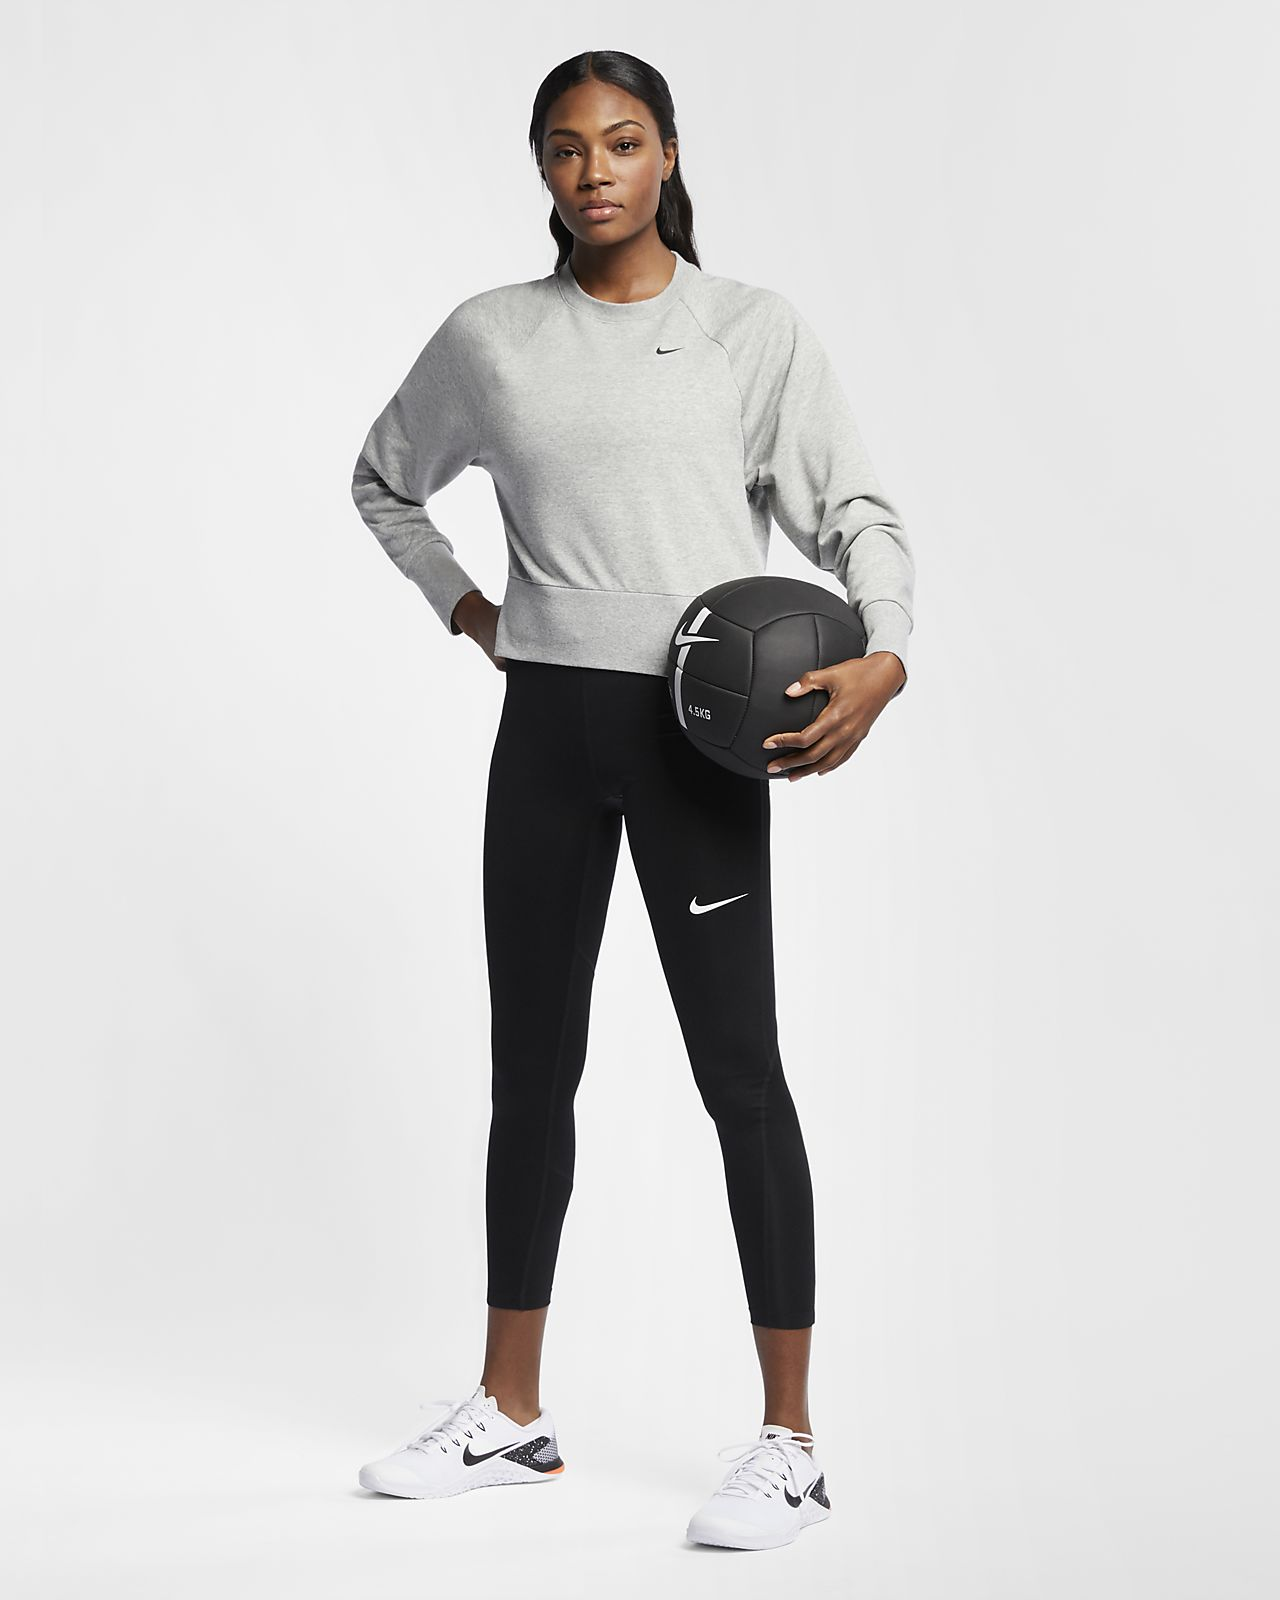 b0084e6abf Nike Dri-FIT Women's Long-Sleeve Yoga Training Top. Nike.com